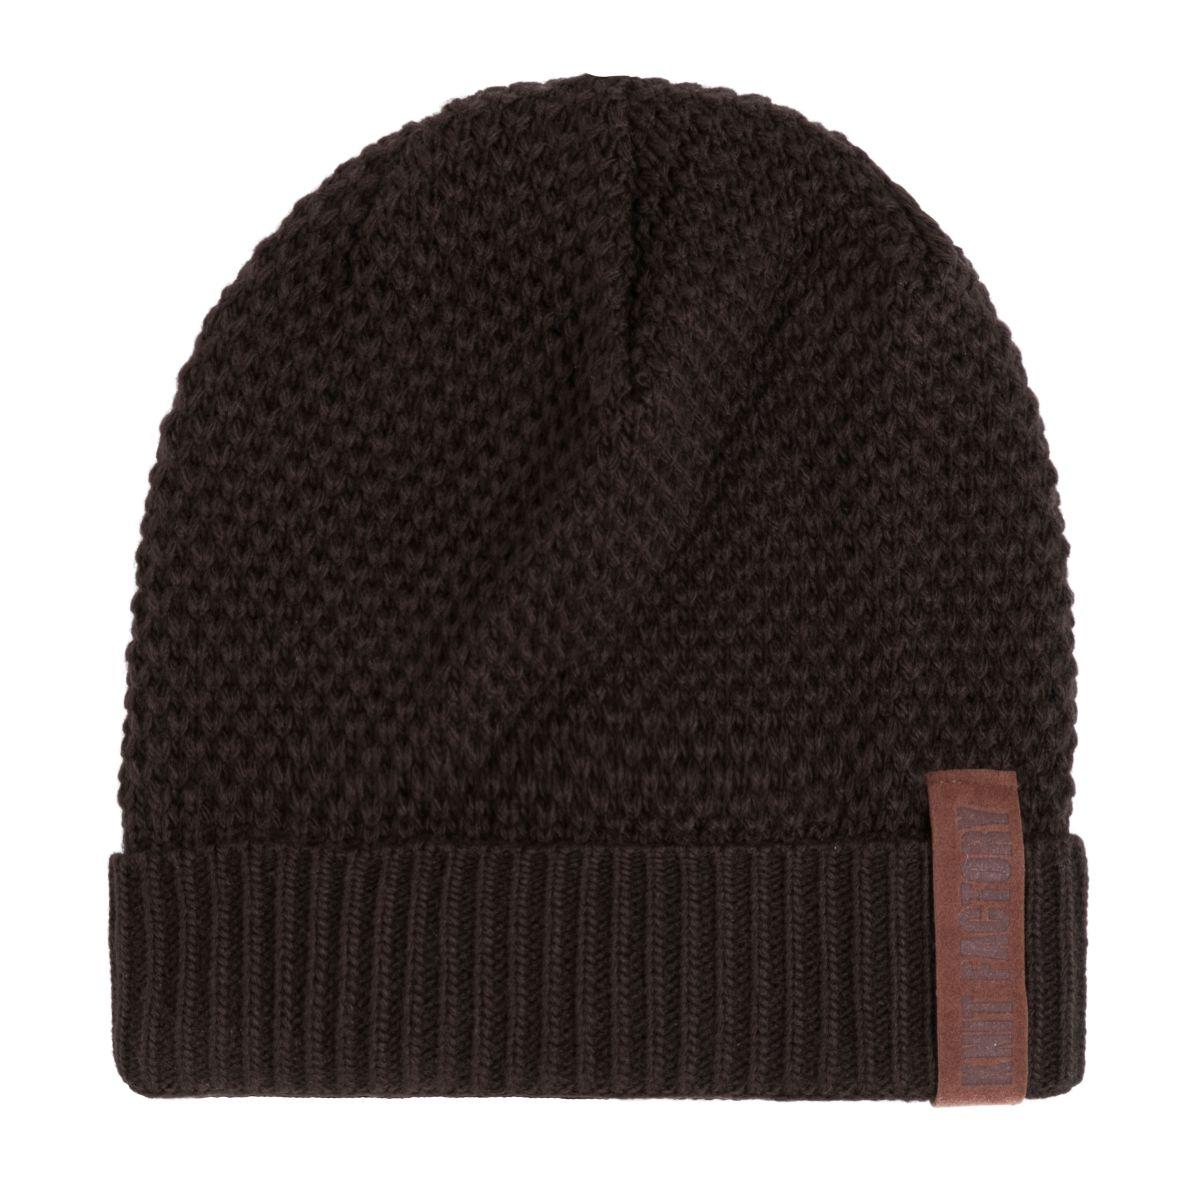 knit factory kf12307003750 jazz muts donkerbruin 1